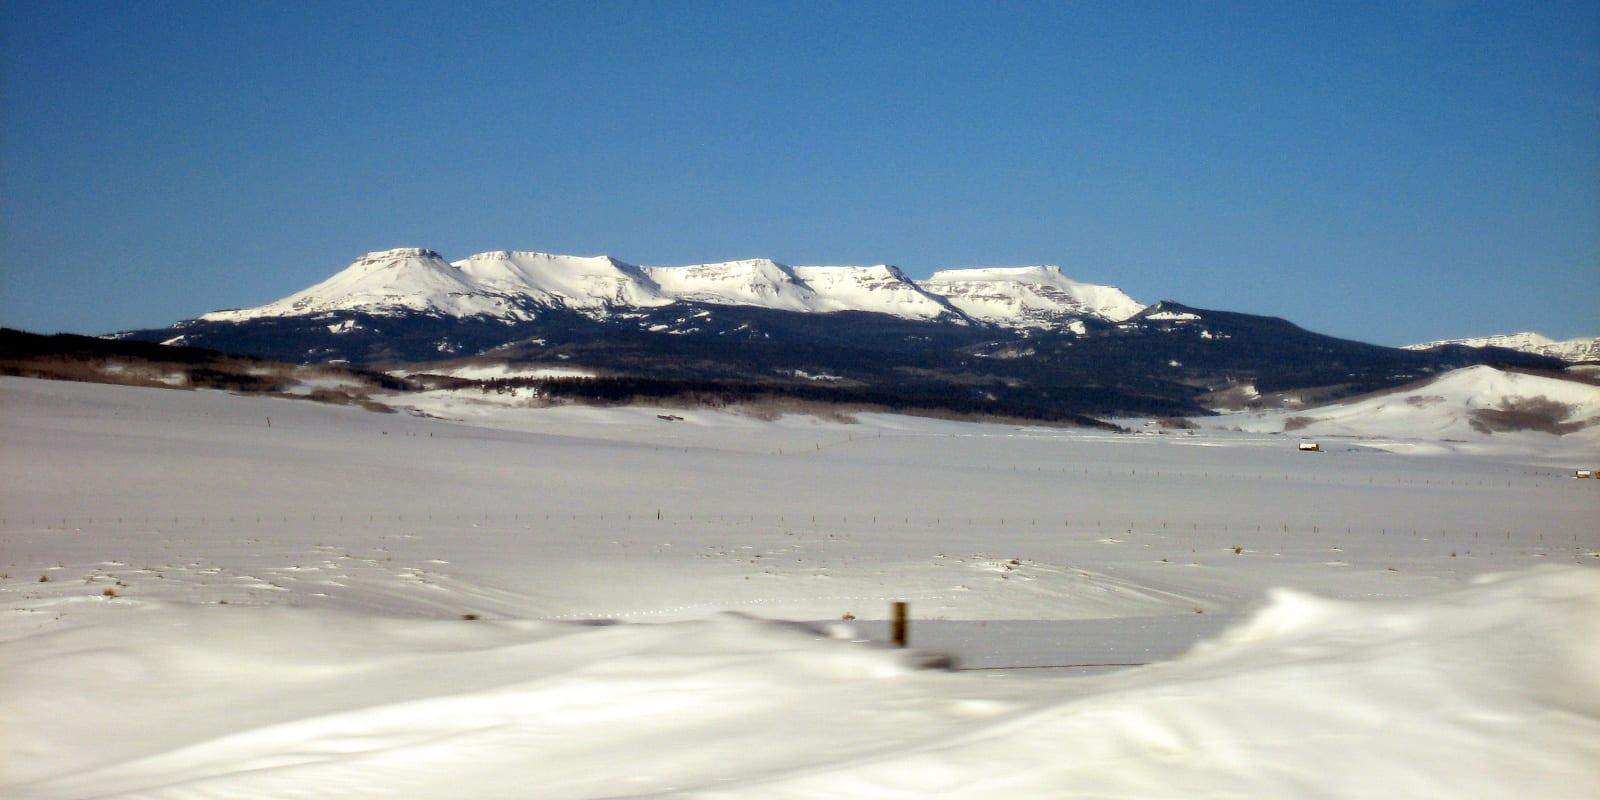 Flat Tops Wilderness Area Winter Snow